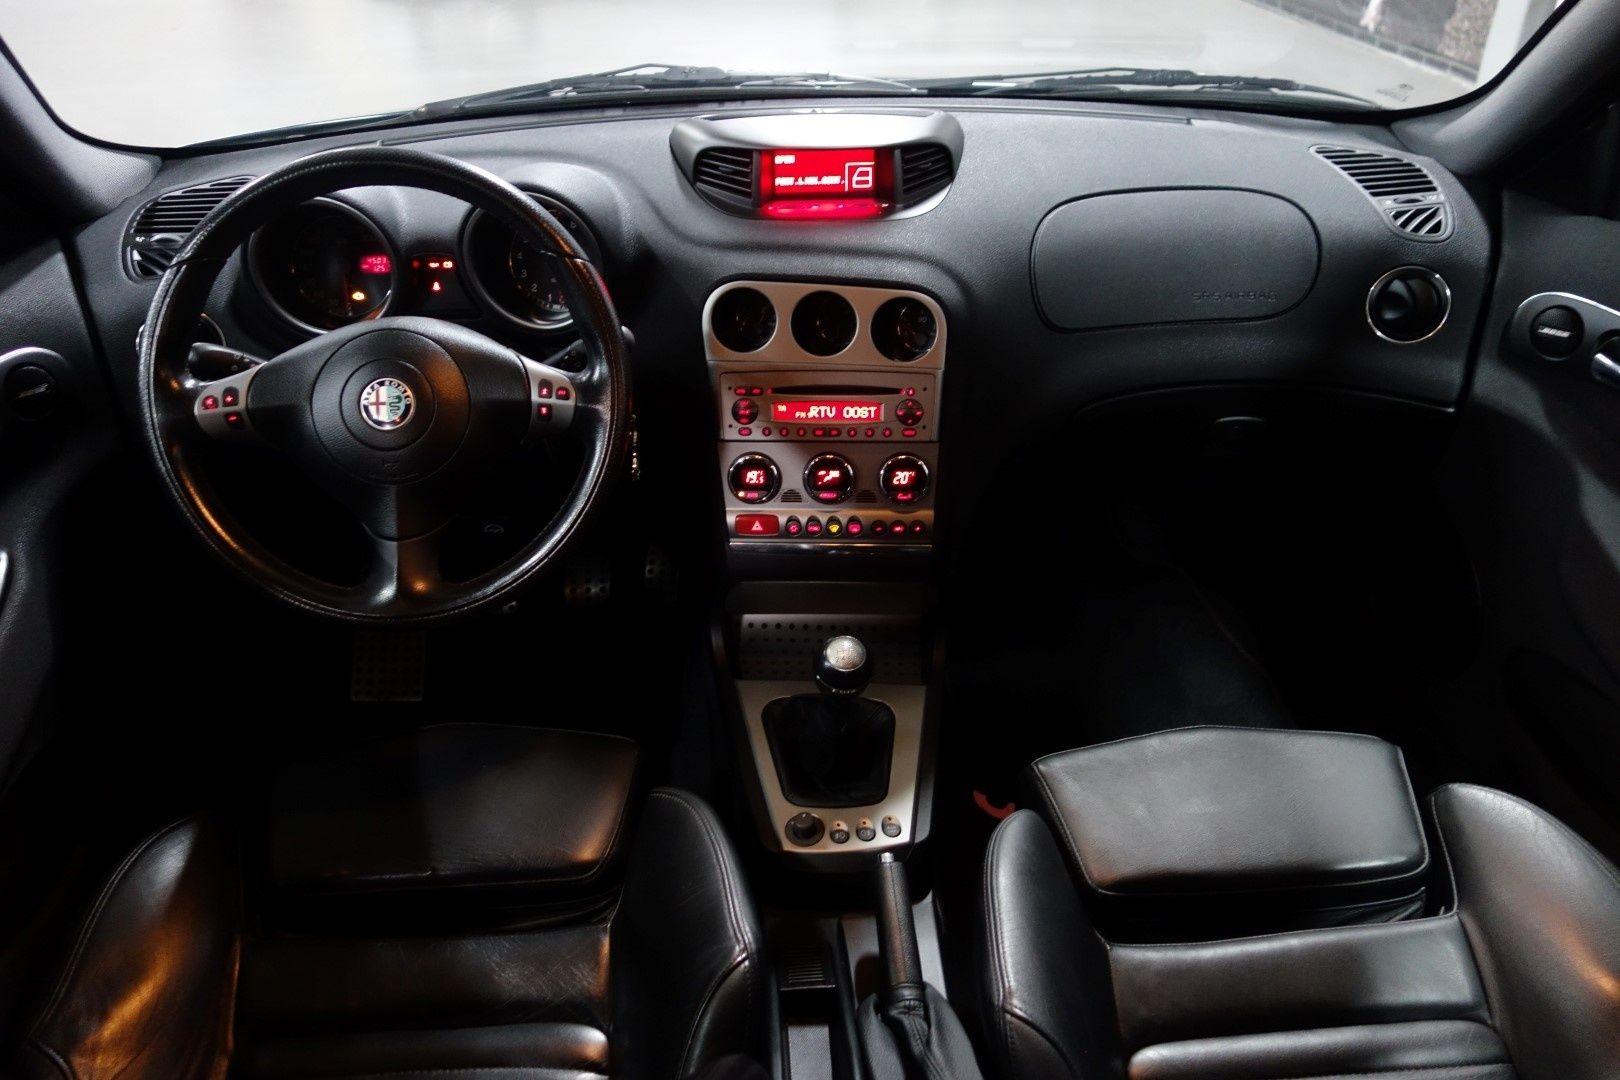 Alfa Romeo 156 GTA 3.2 V6 Sportwagon (2003) | Car Interiors | Pinterest